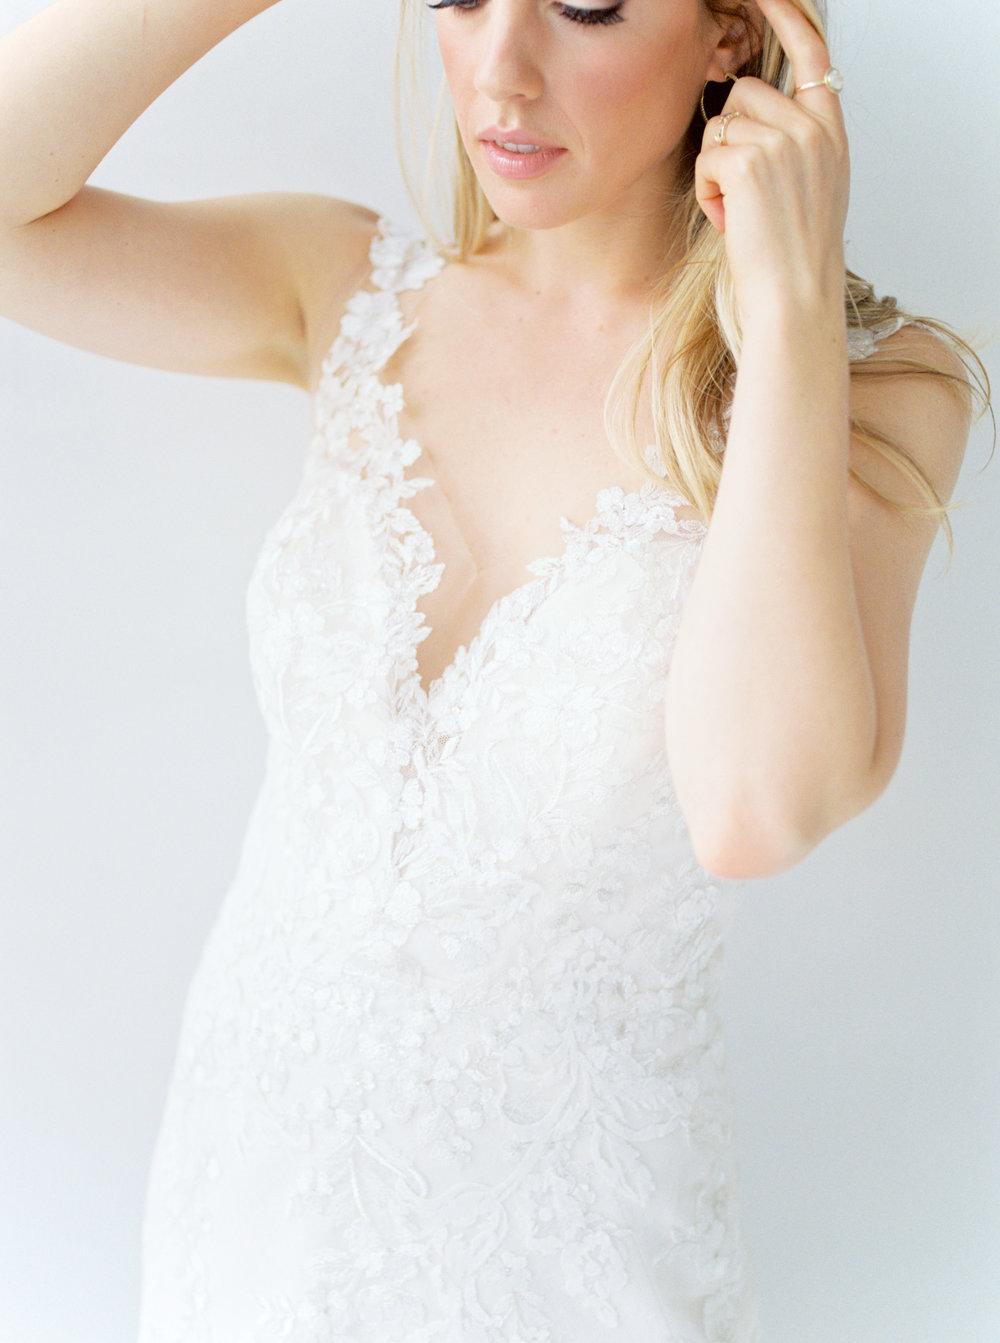 haley-richter-photography-liberty-and-lace-philadelphia-wedding-dress-boutique-106.jpg